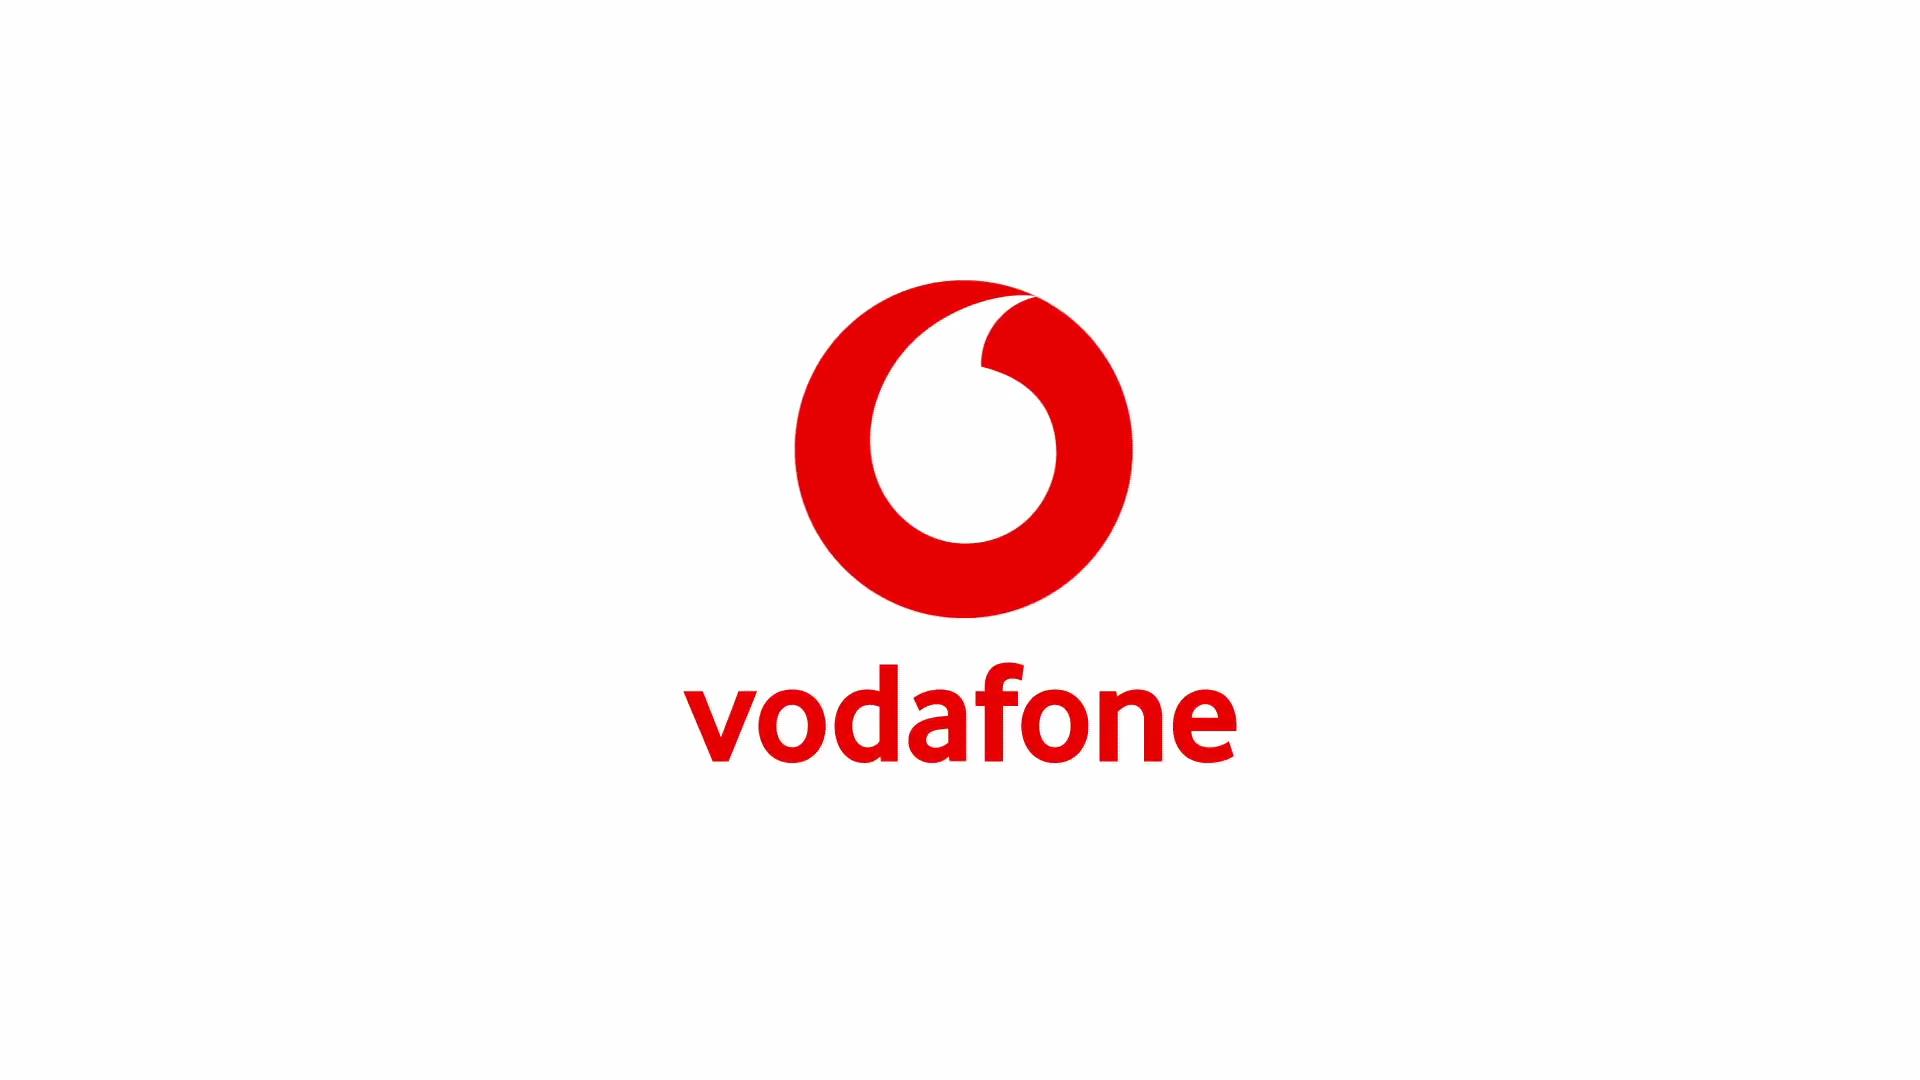 vodafone estate 2018 logo offerta 30 gb